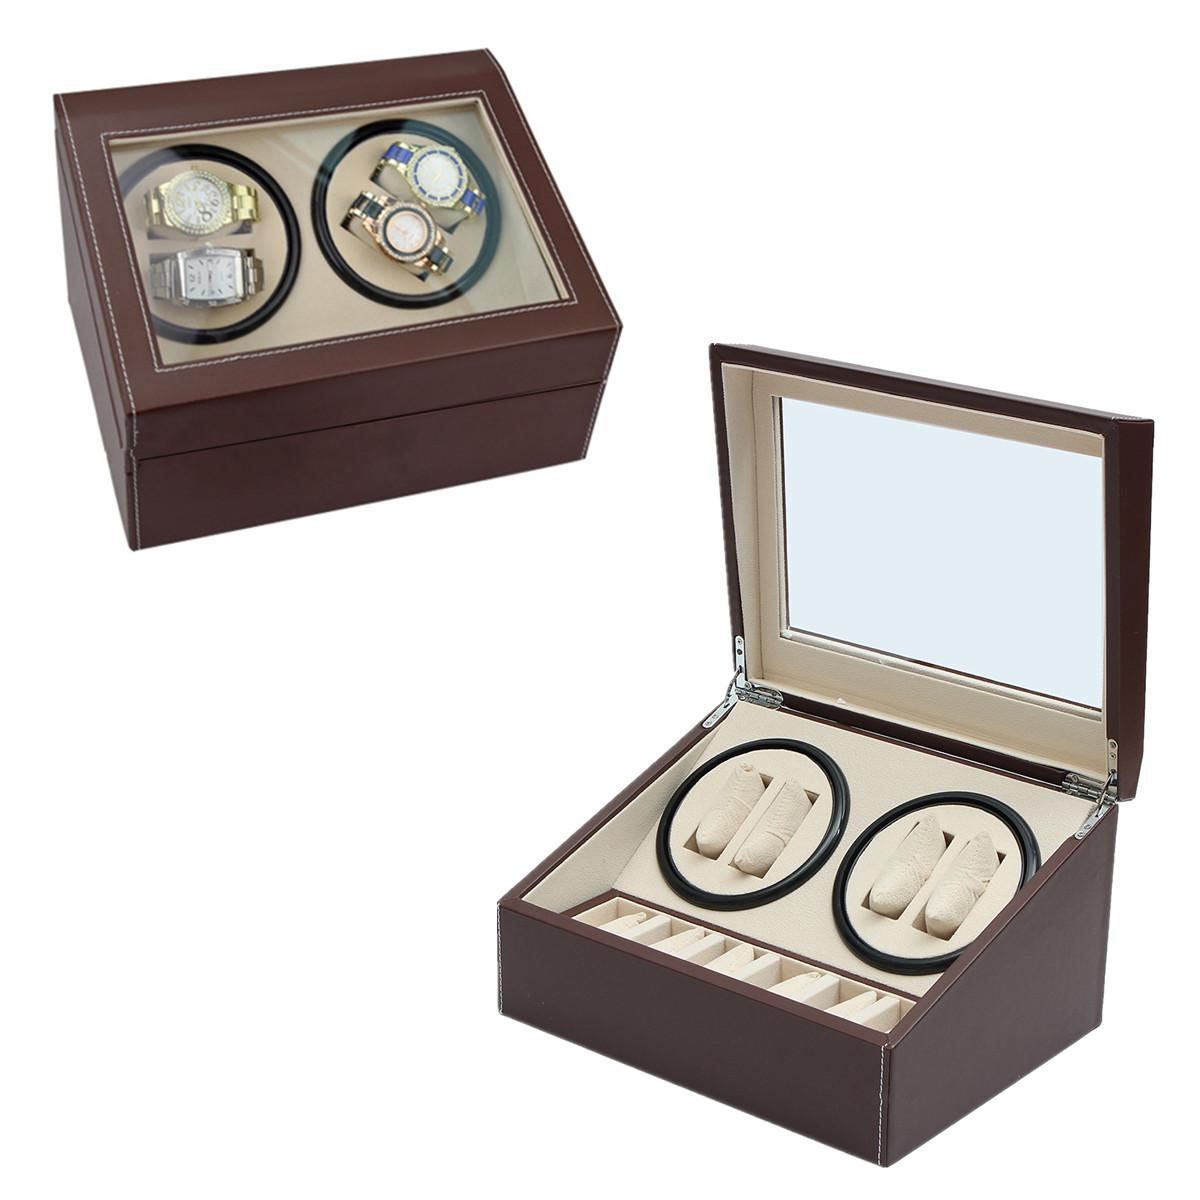 Automatic 4+6 Watch Winder Rotator Storage Case Display Watch Box